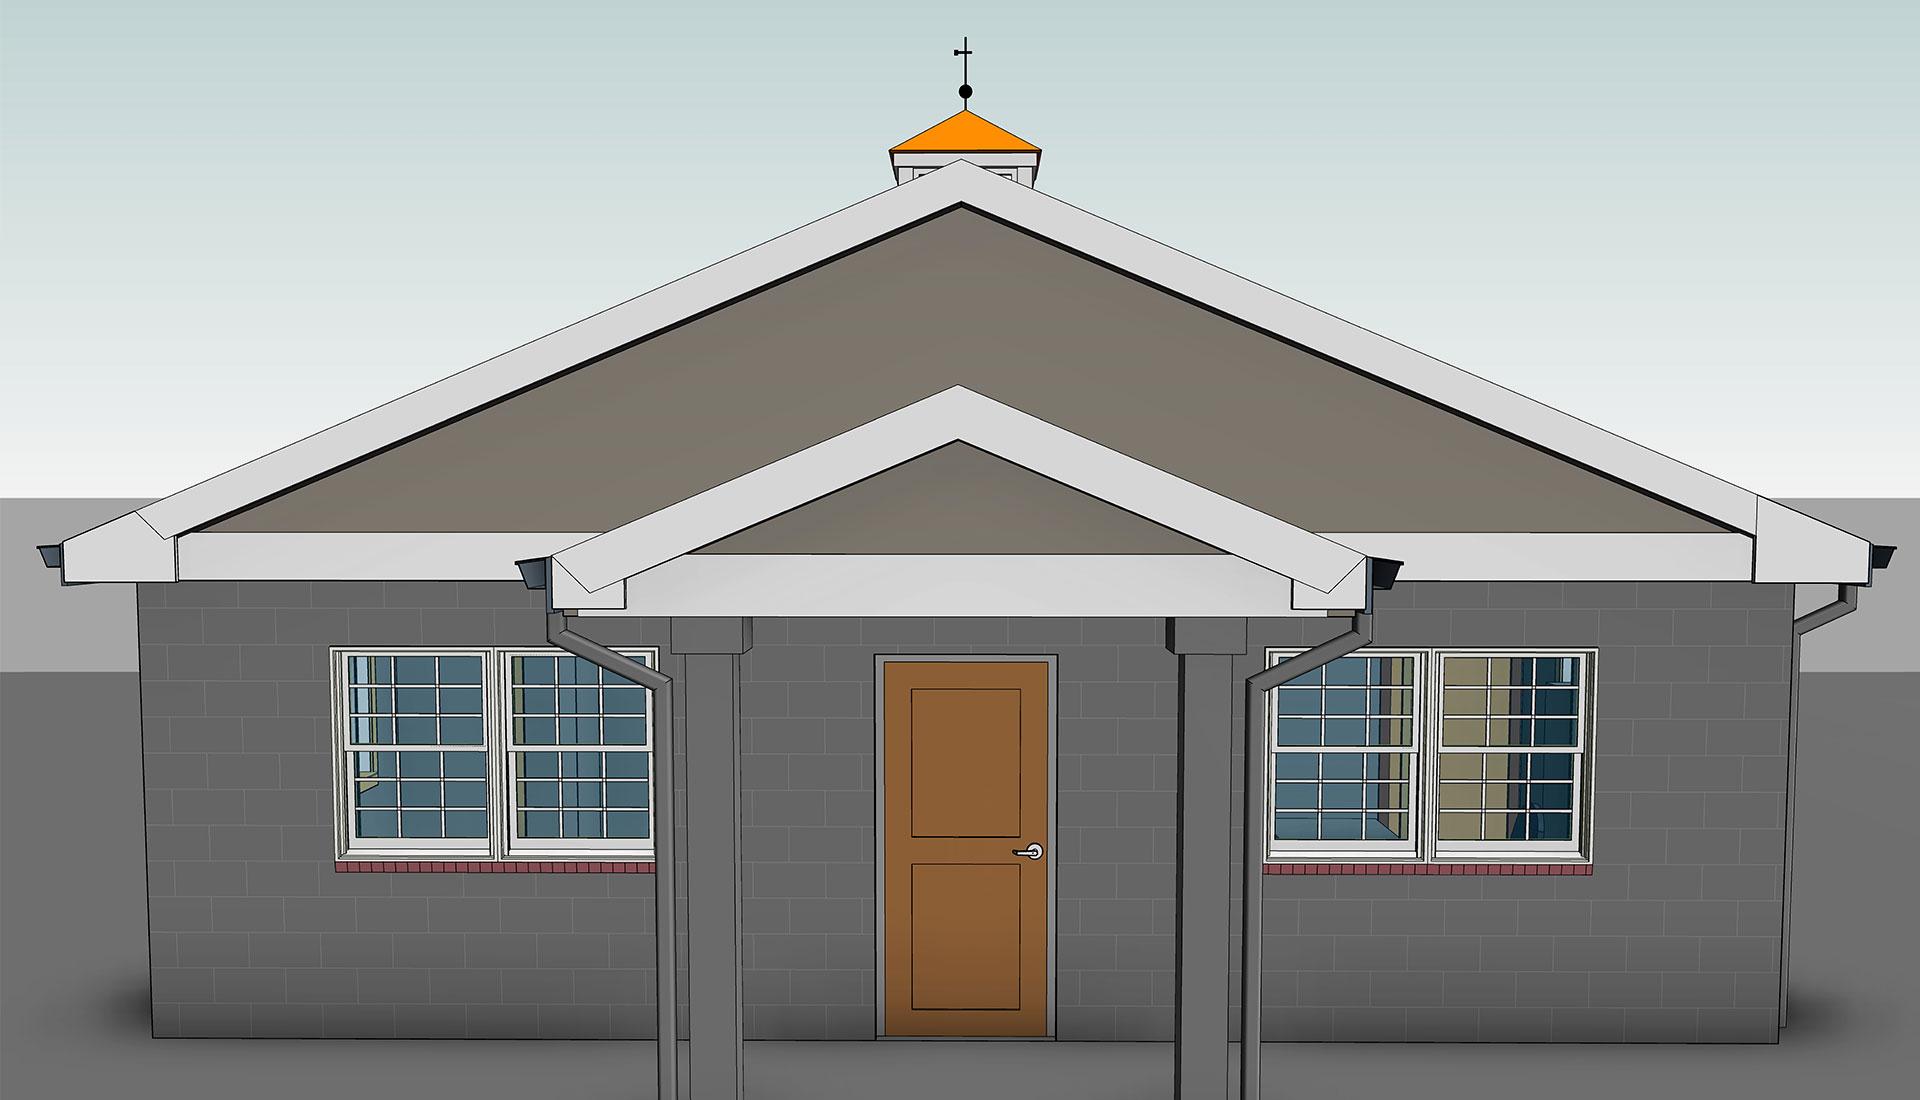 Front-Elevation_Architectural-Model_Windsor-Animal_Hospital_BIM-Modeling-Project-by-United-BIM